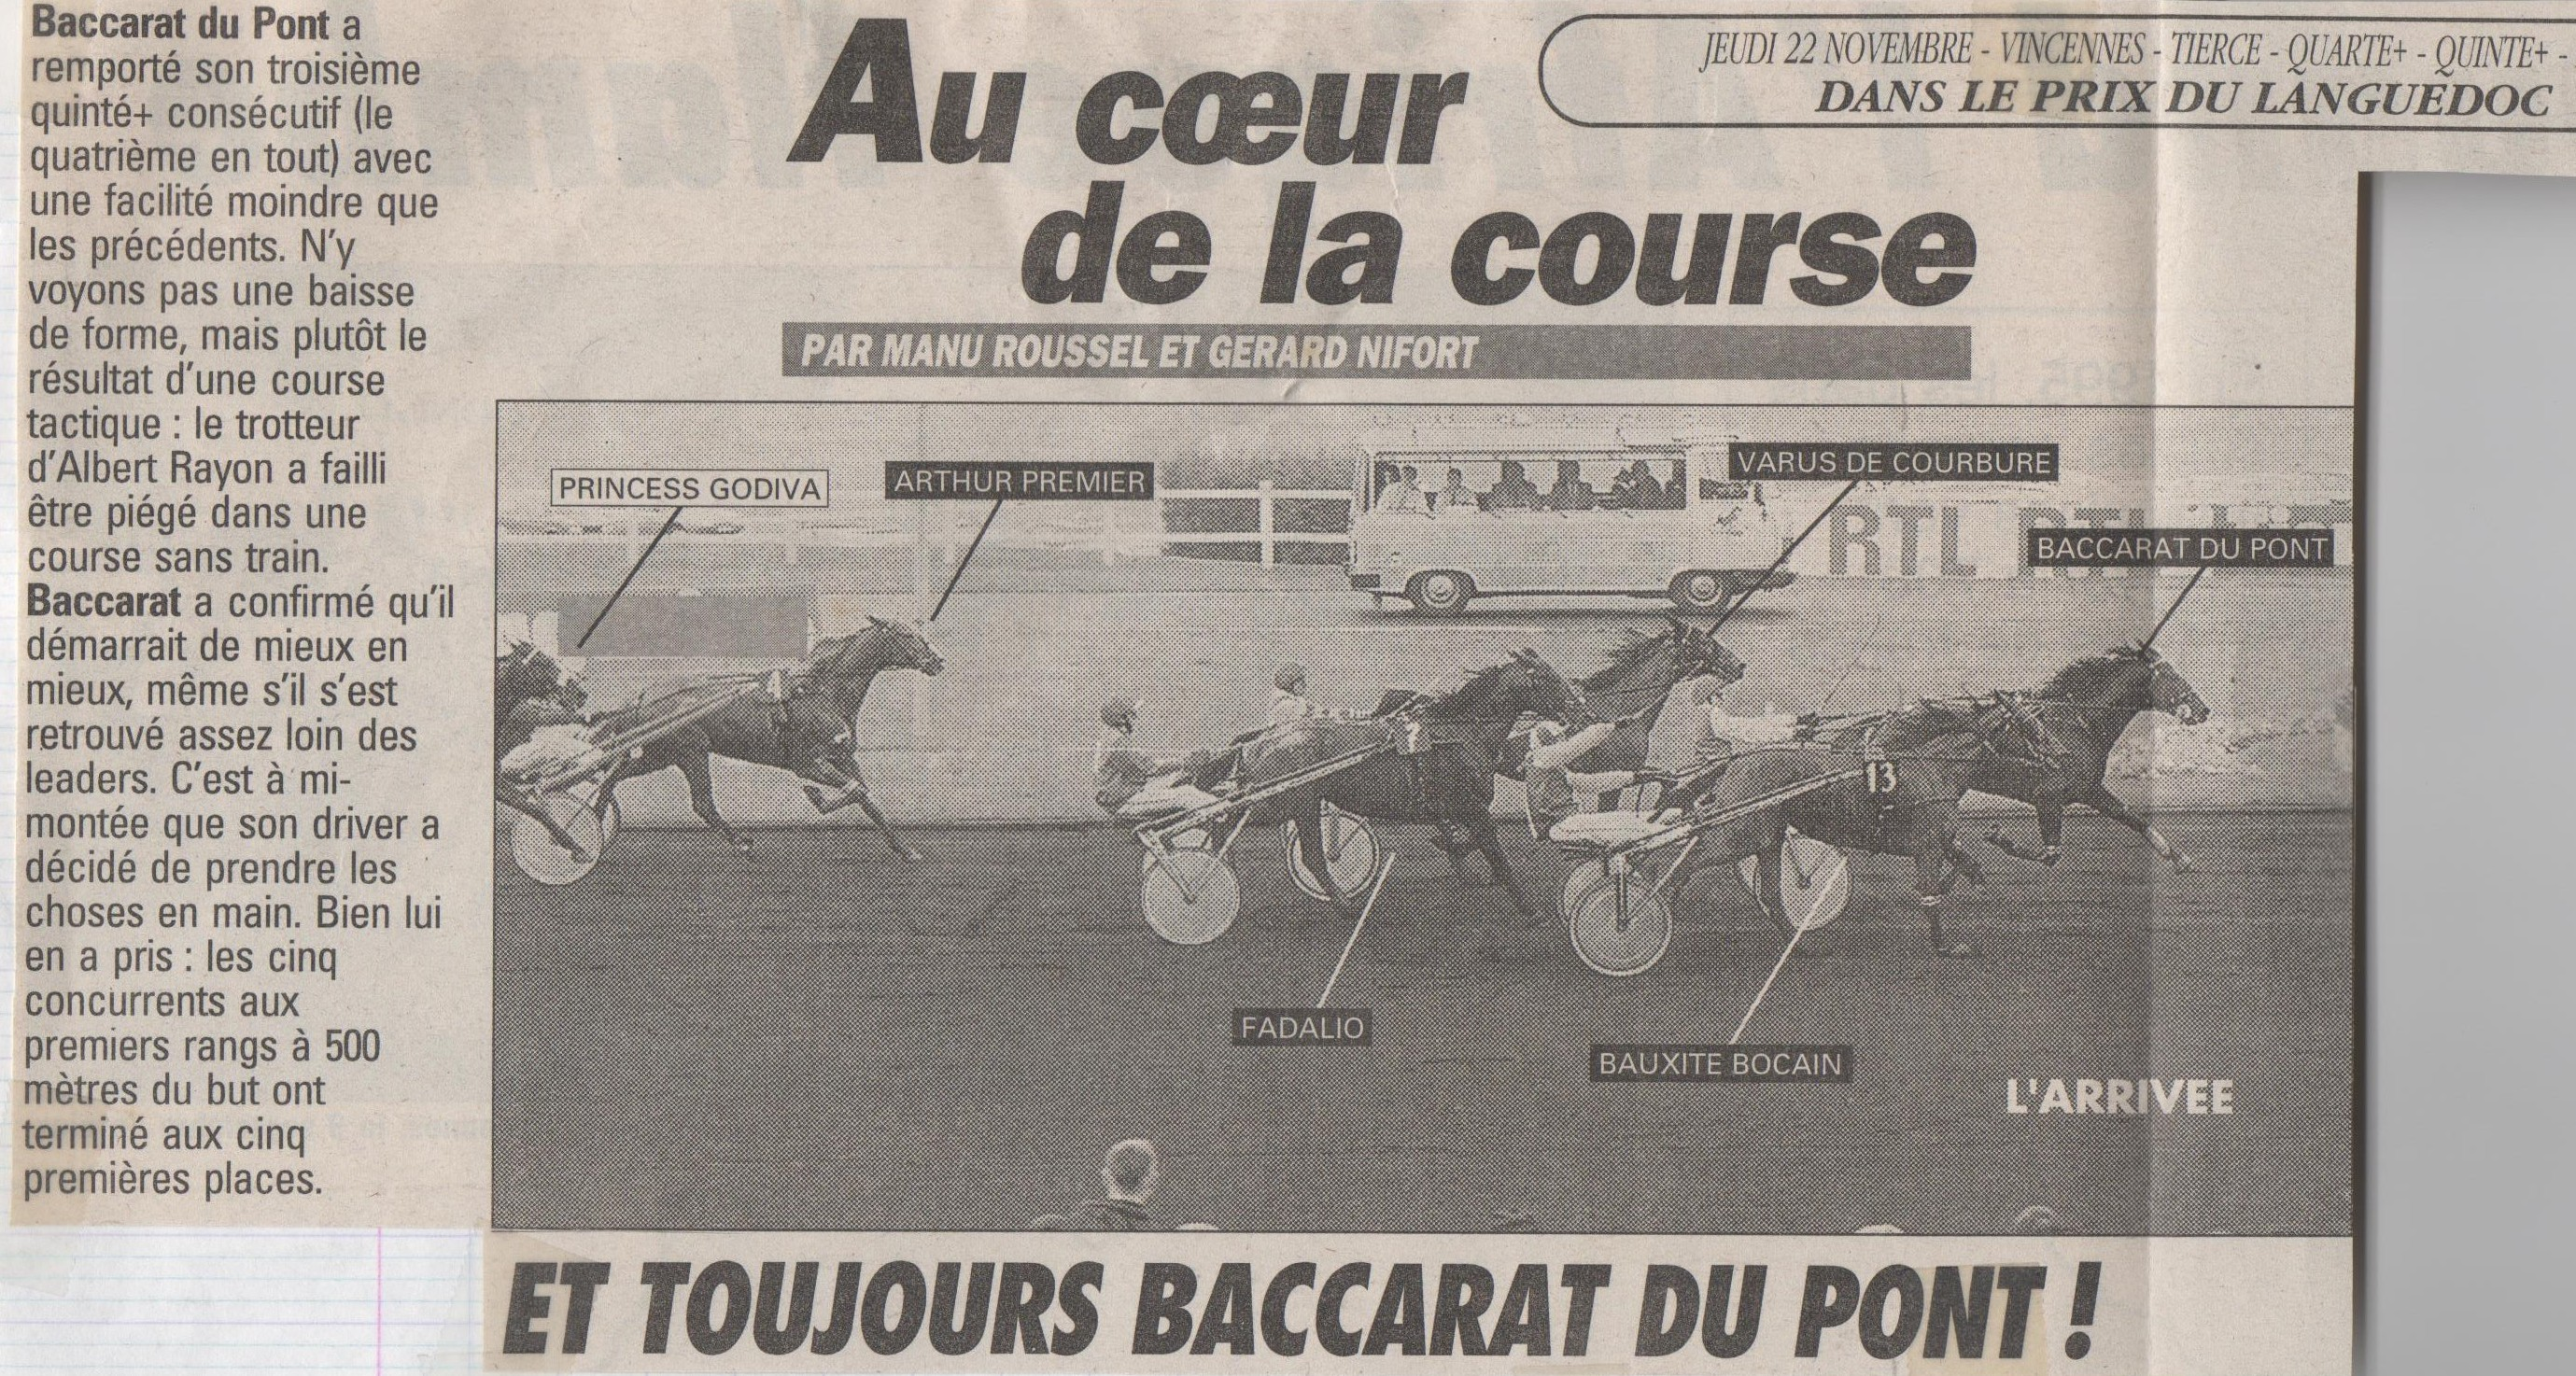 1995 11 23 Baccarat du Pont Prix du Languedoc (2)